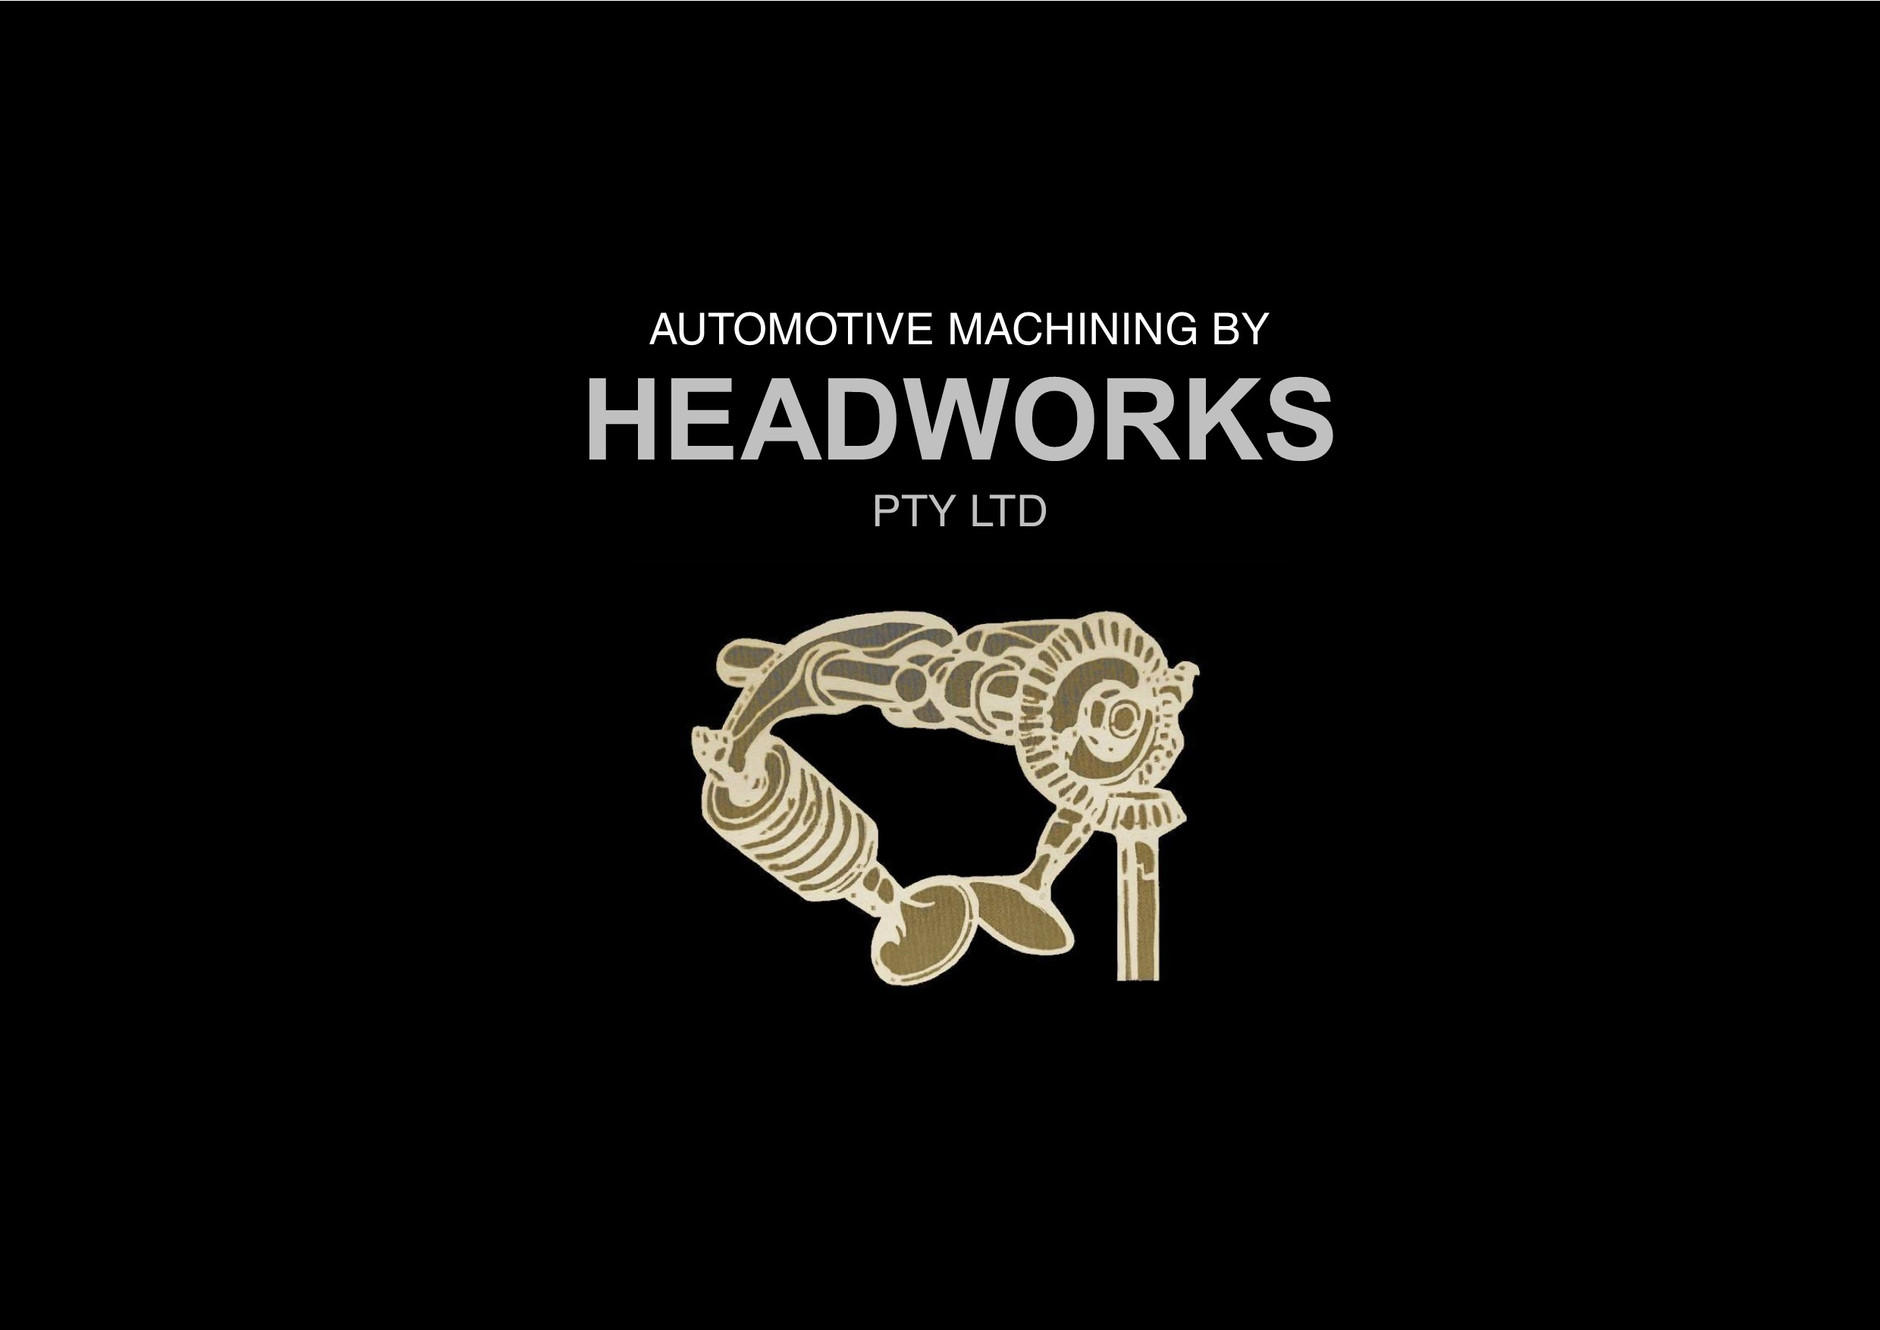 headworks